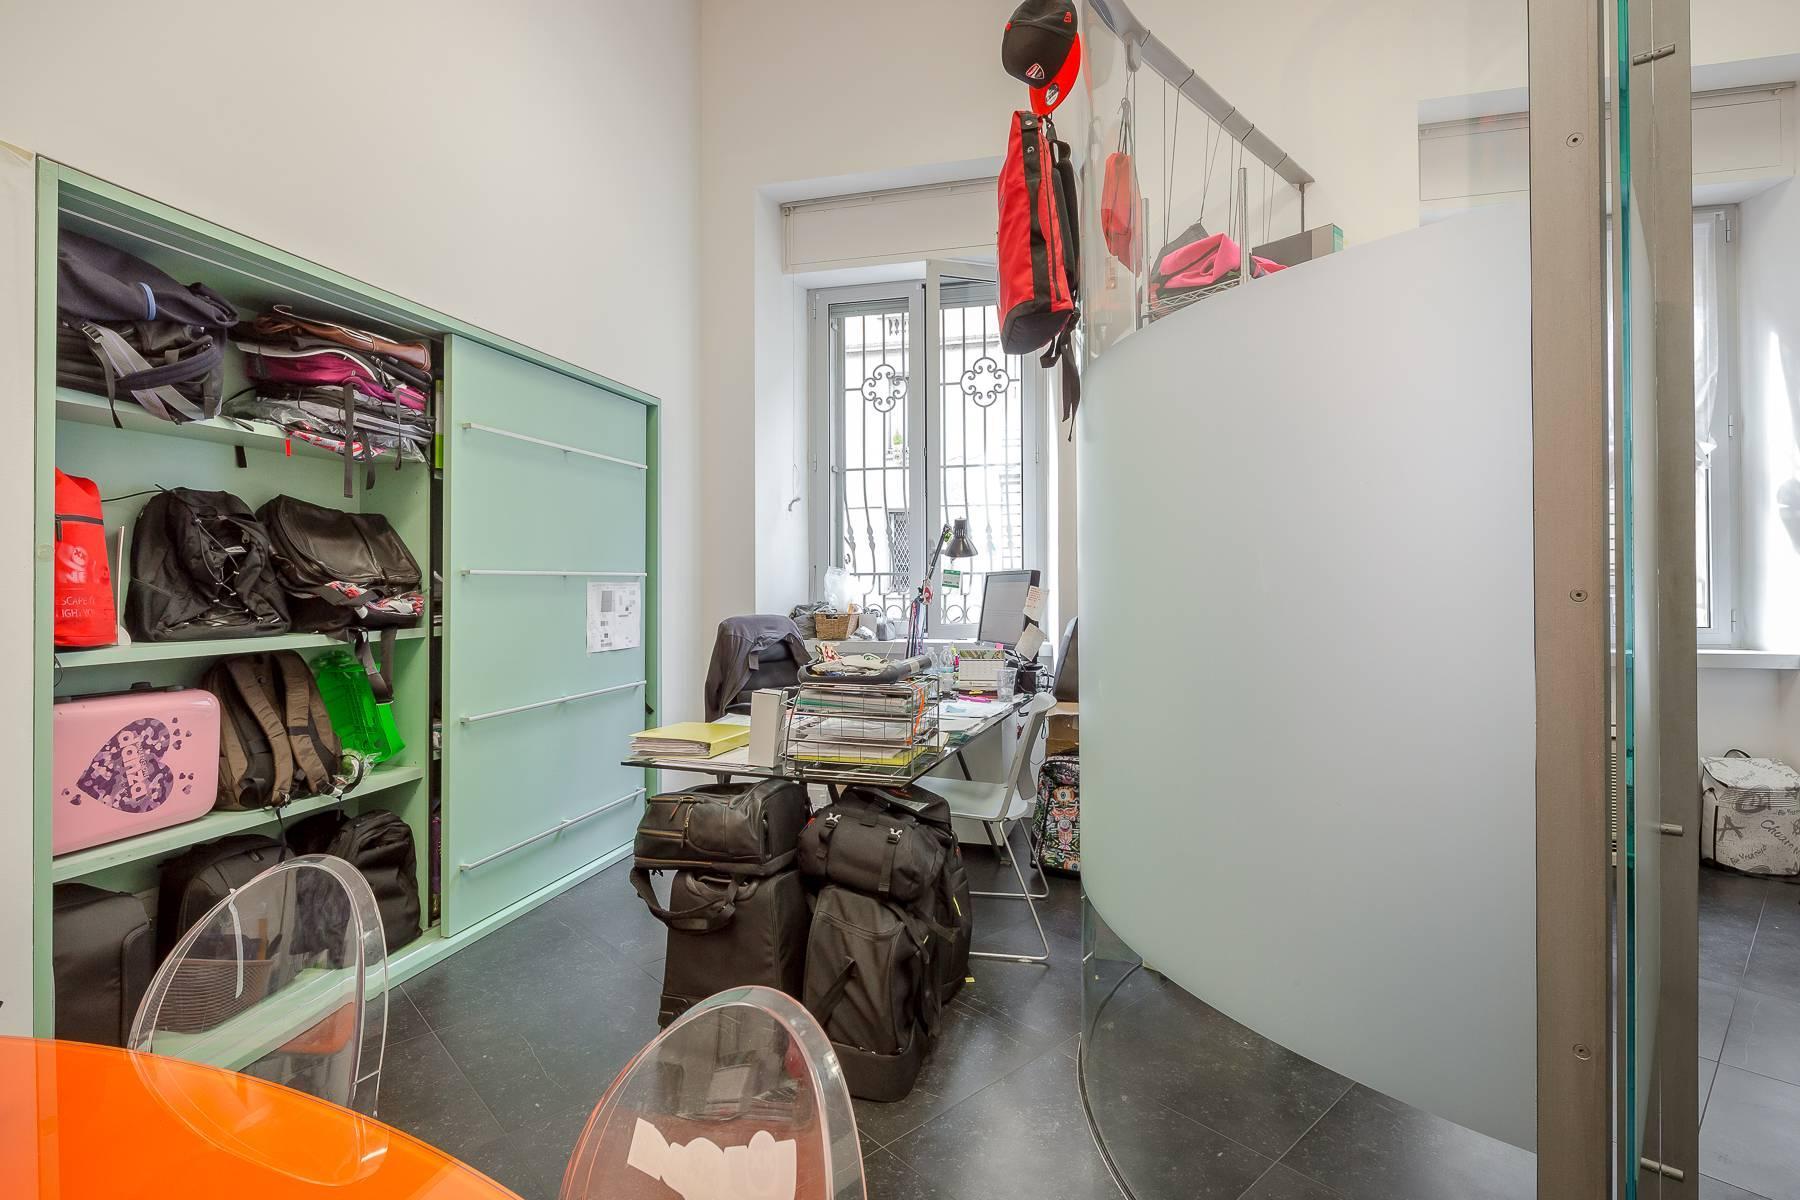 Open space office/residential property in Piazza Giovine Italia/Via Aurelio Saffi - 22